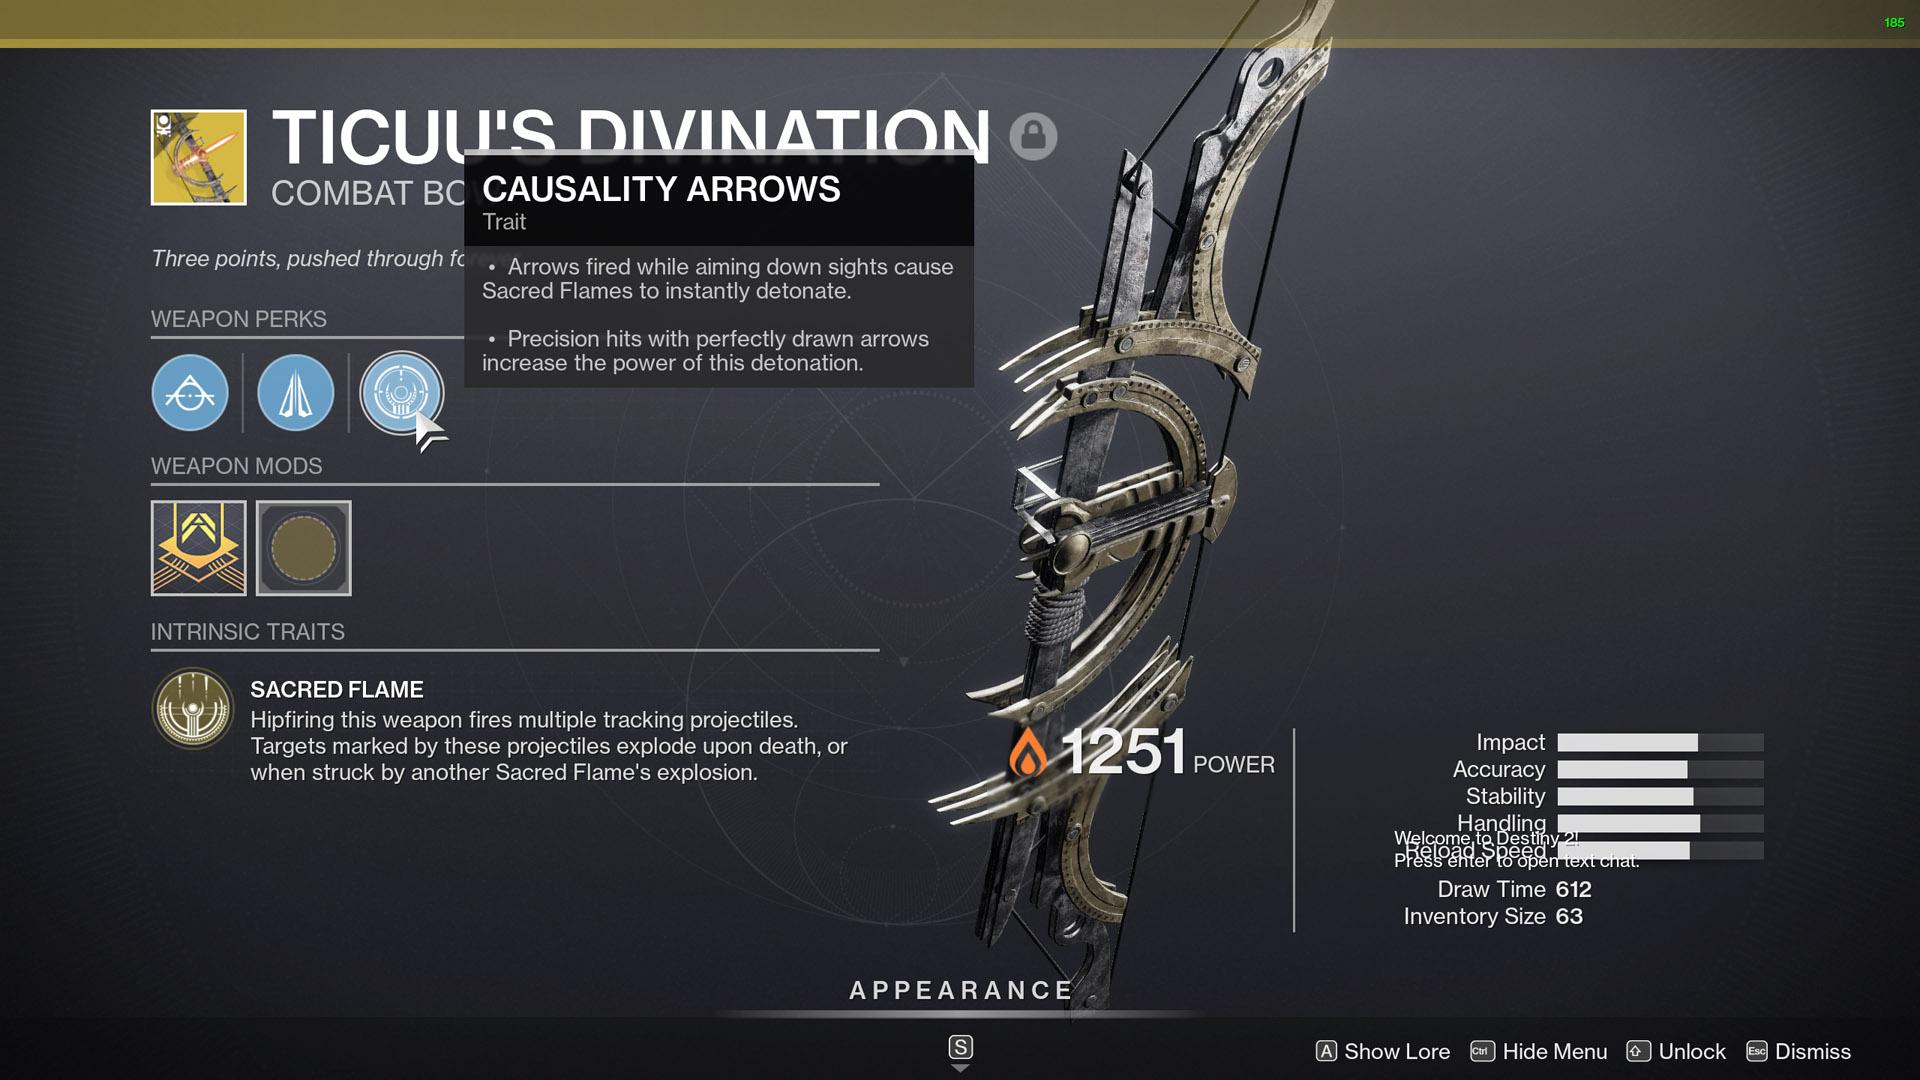 destiny 2 ticuus divination perks